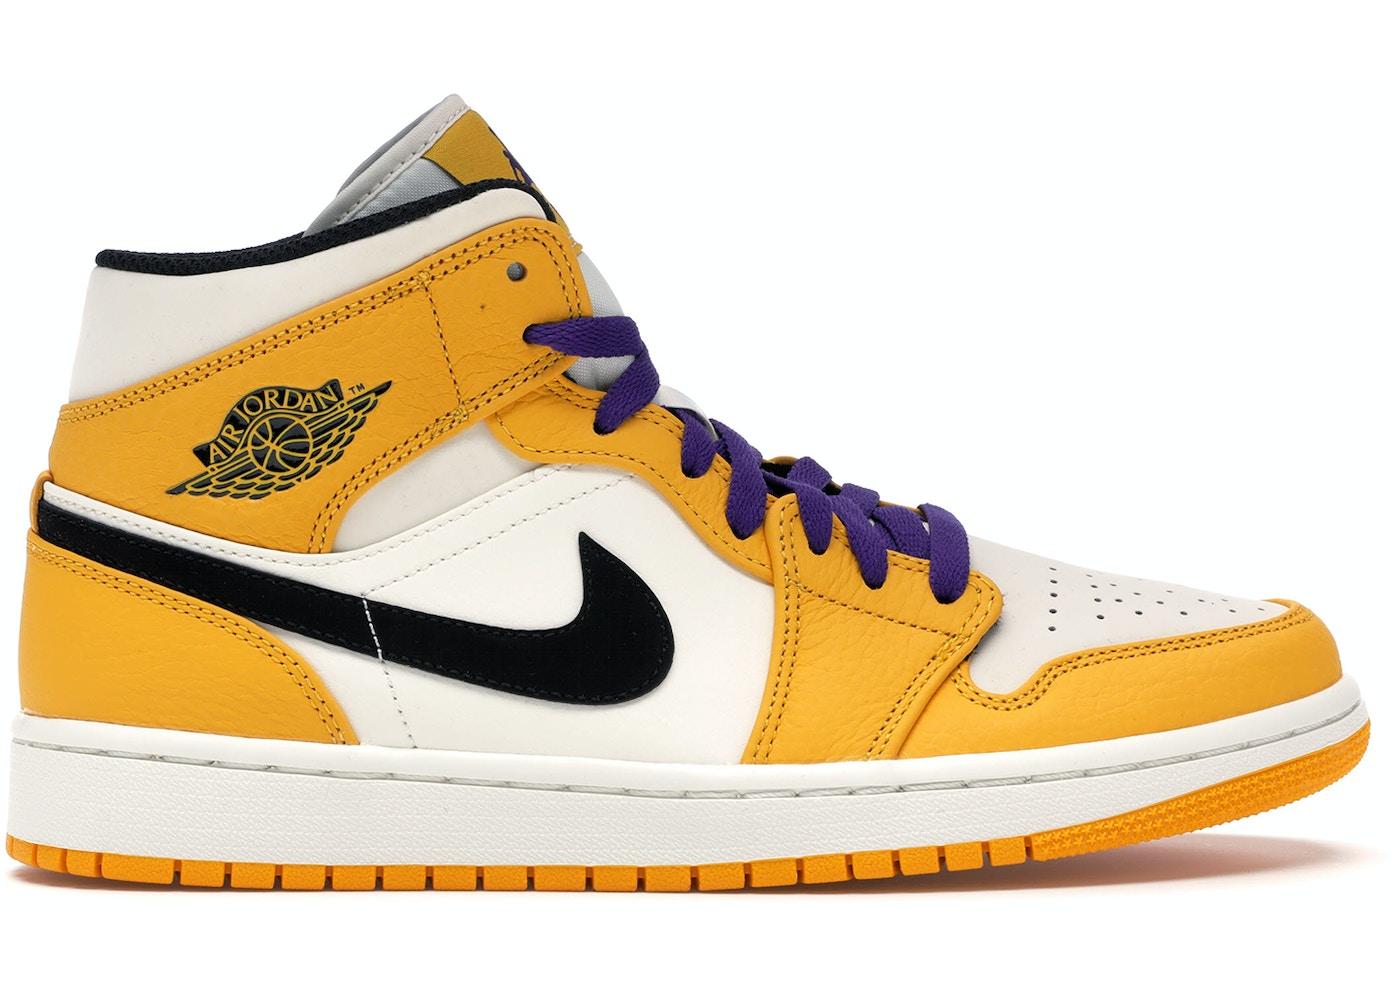 0a73bef15afae6 Jordan 1 Mid SE Lakers - 852542-700